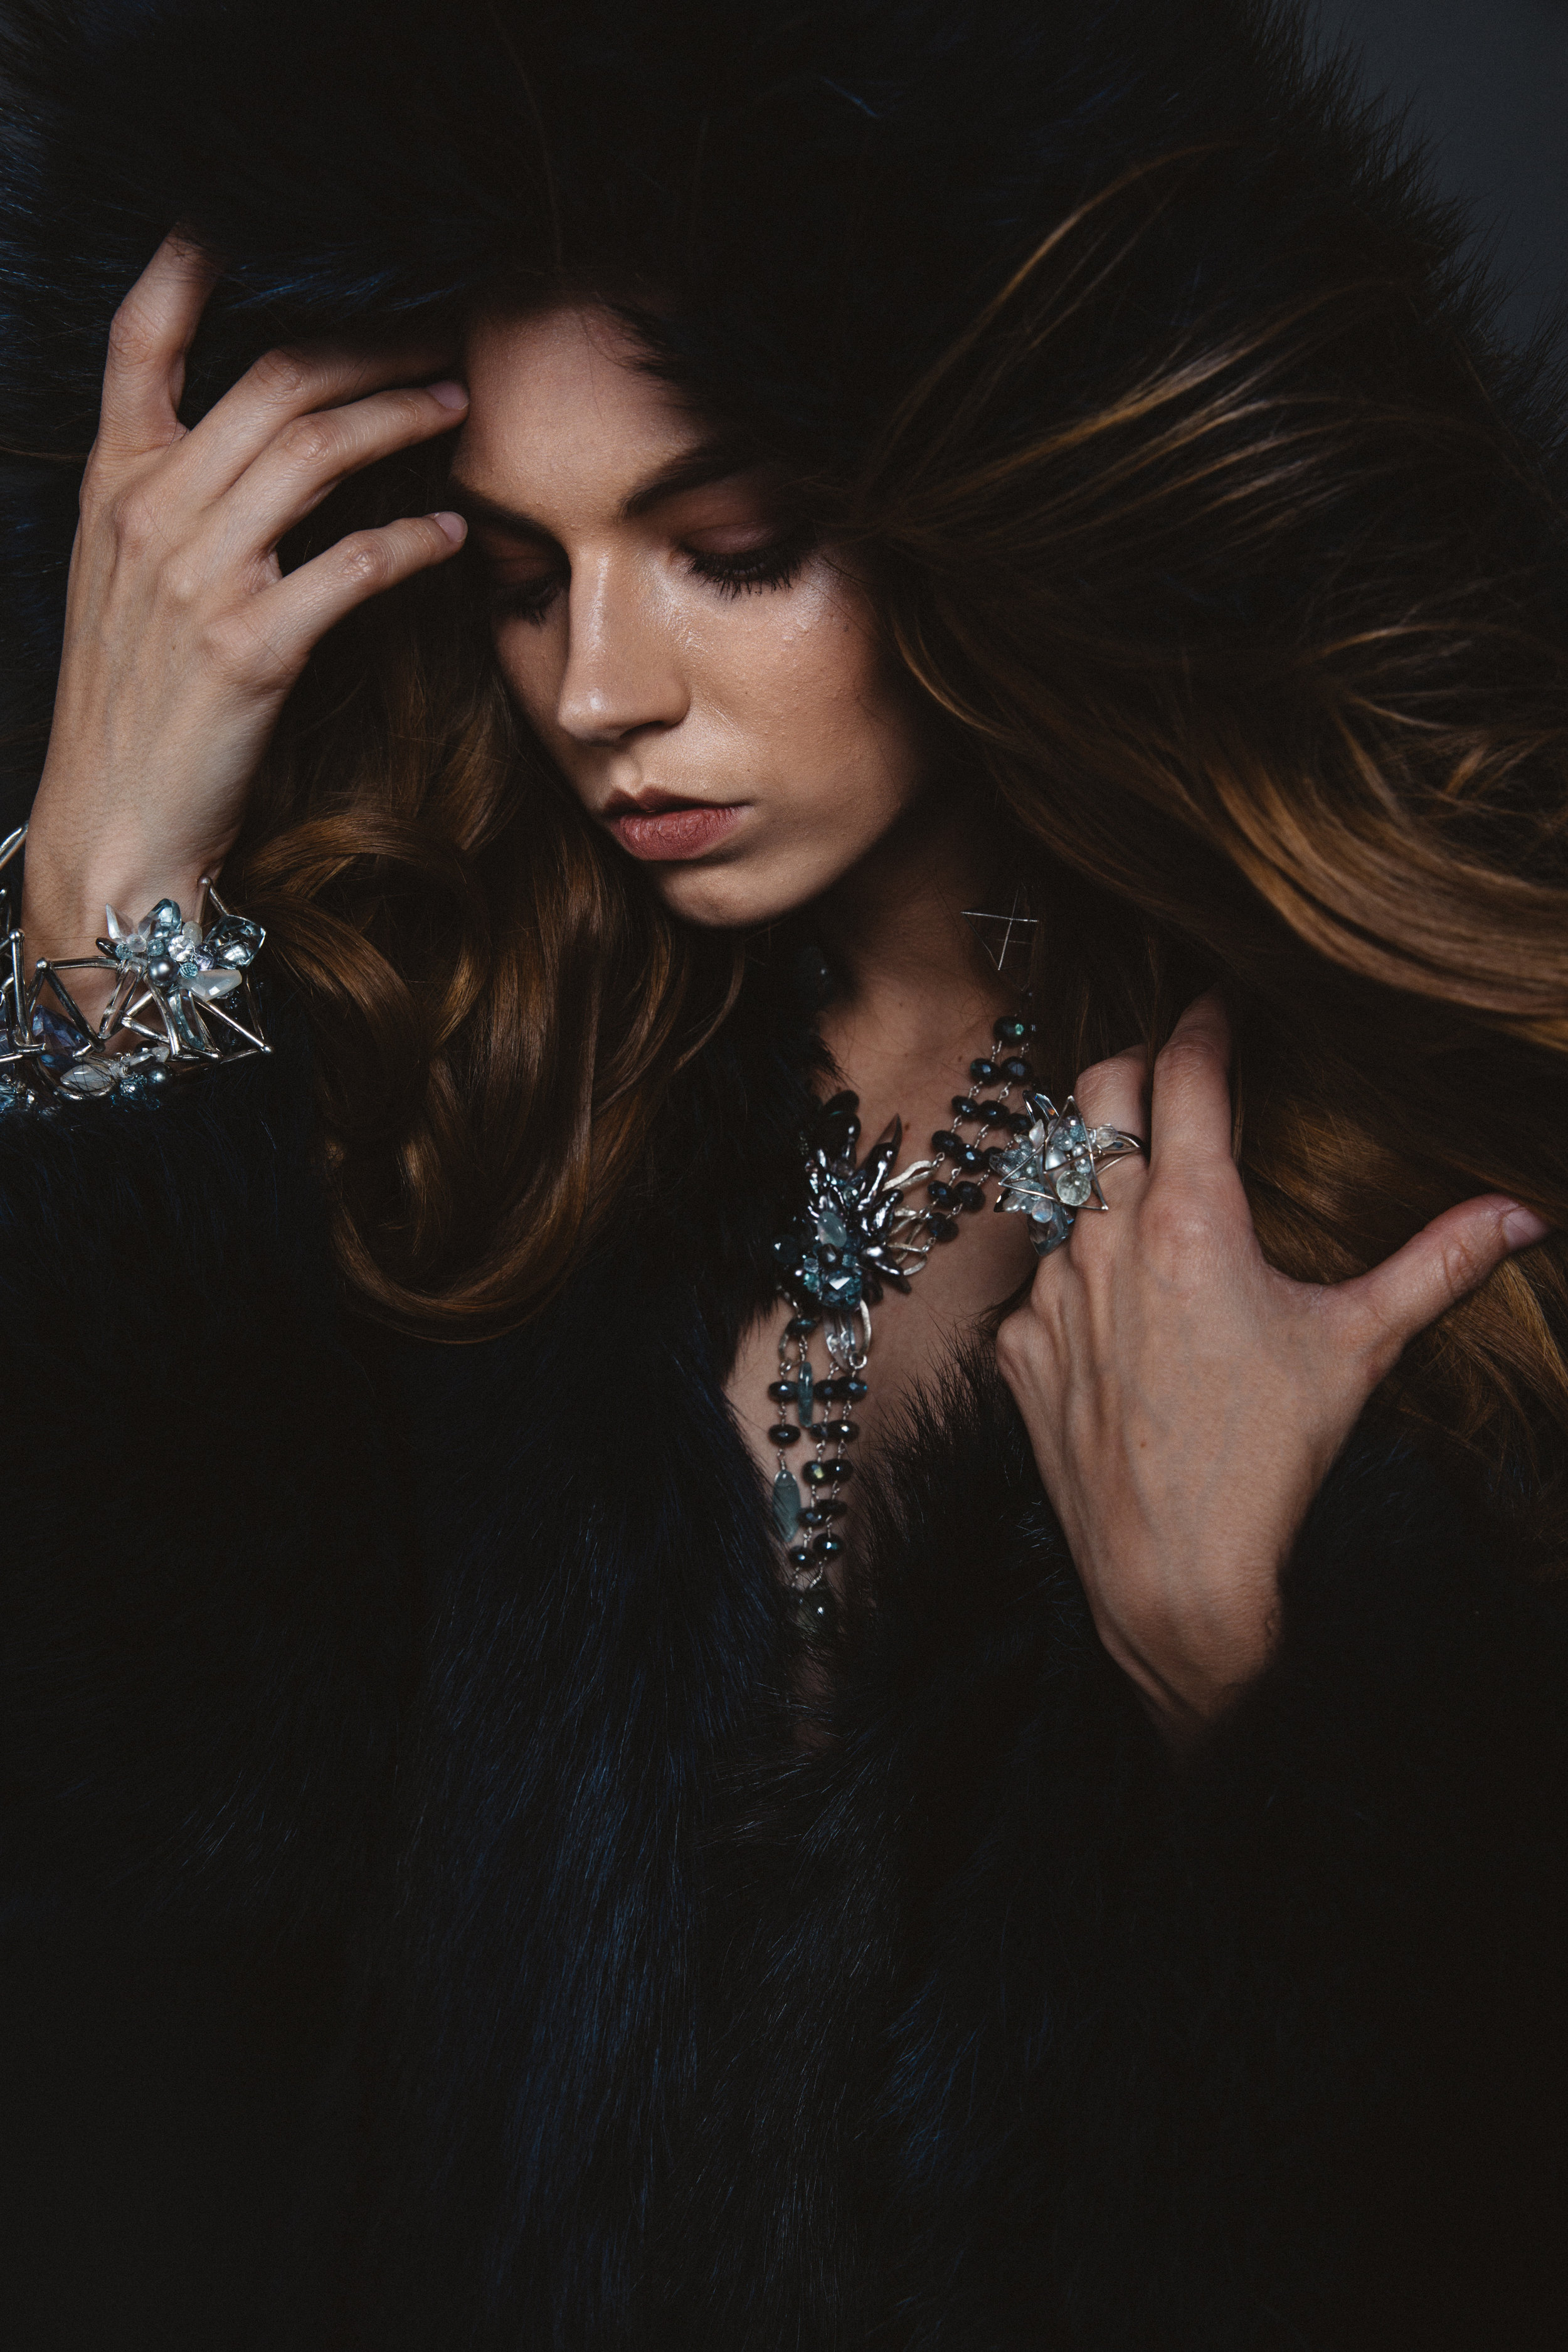 model wearing a statement gemstone necklace